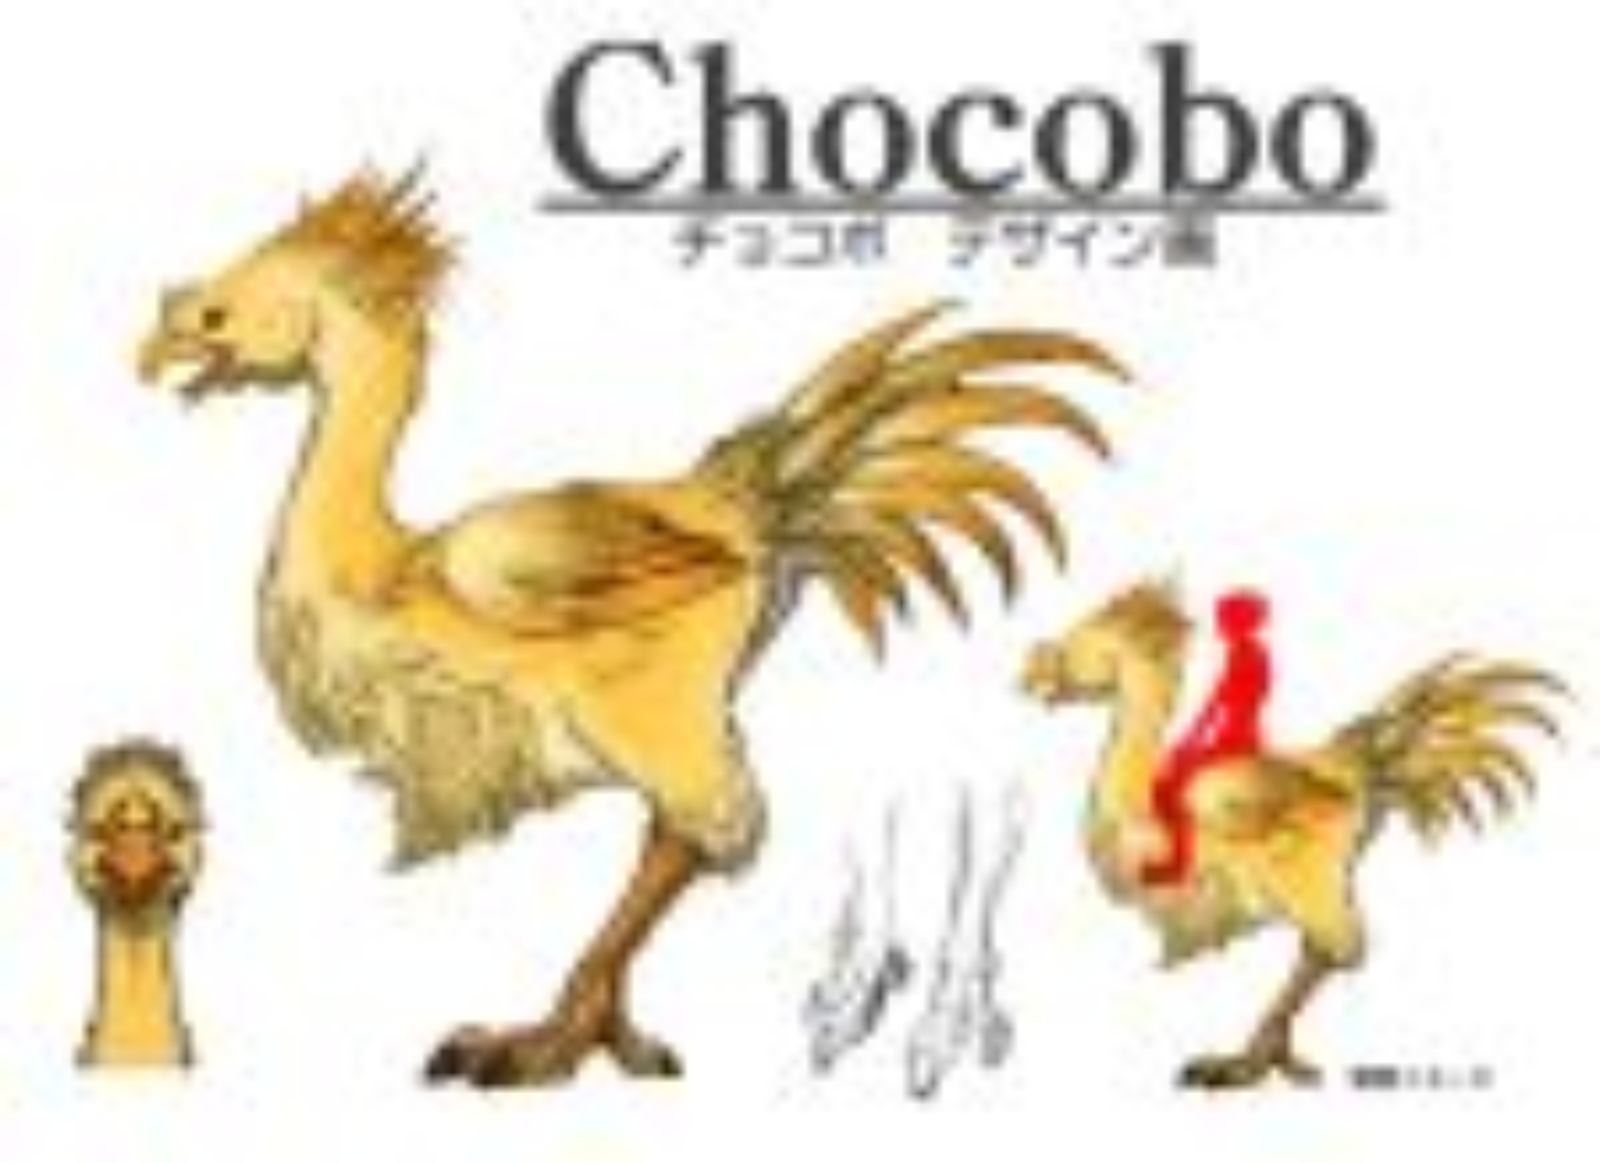 Final Fantasy Xv Screens And Concept Art 1